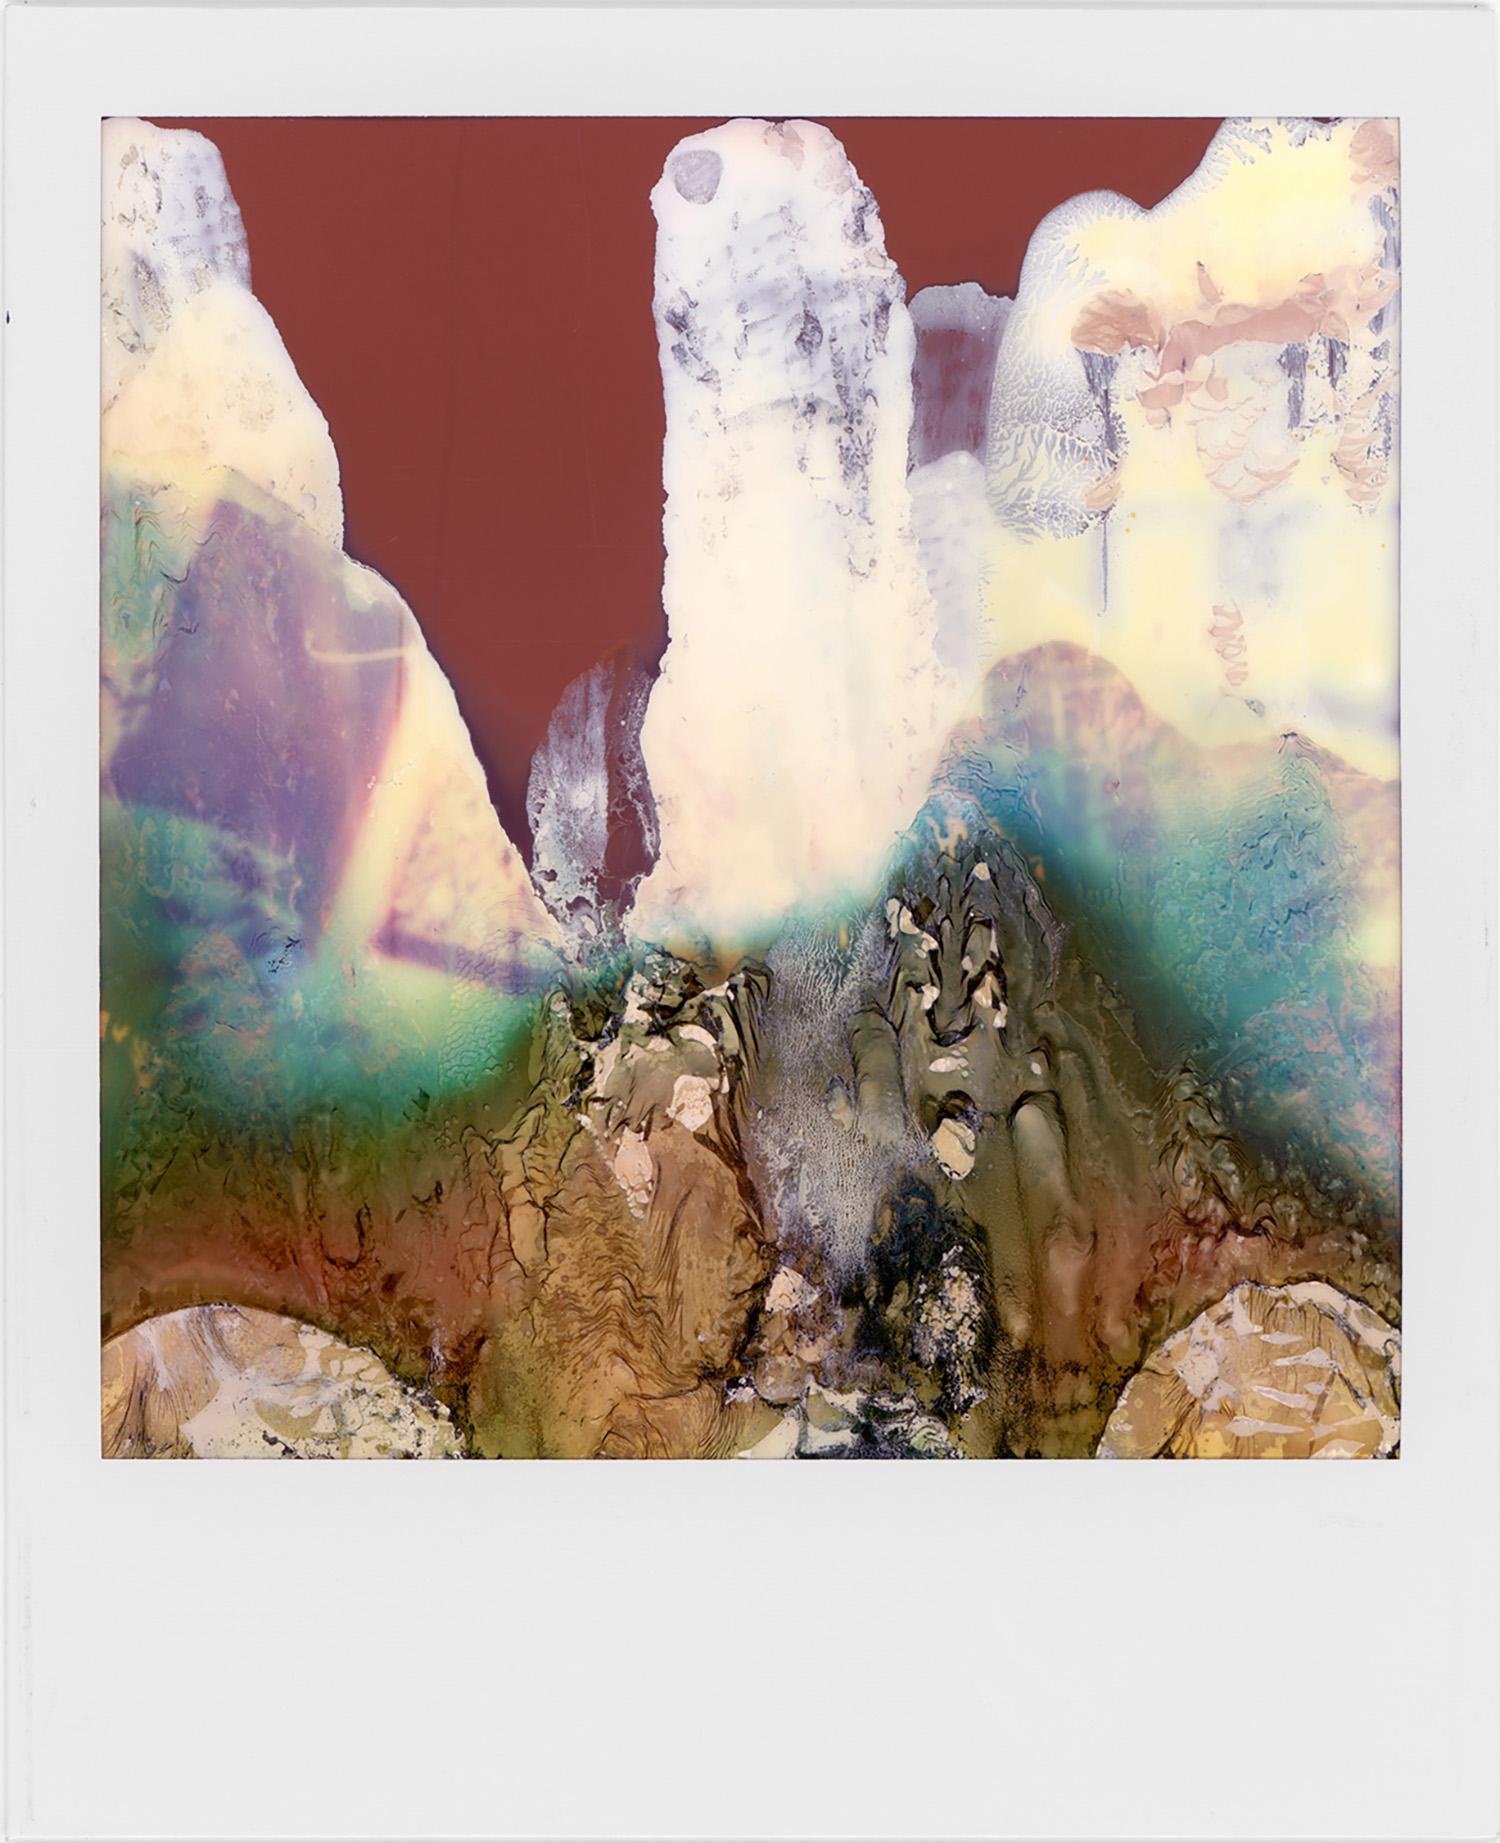 Ruined Polaroid #51, 2011